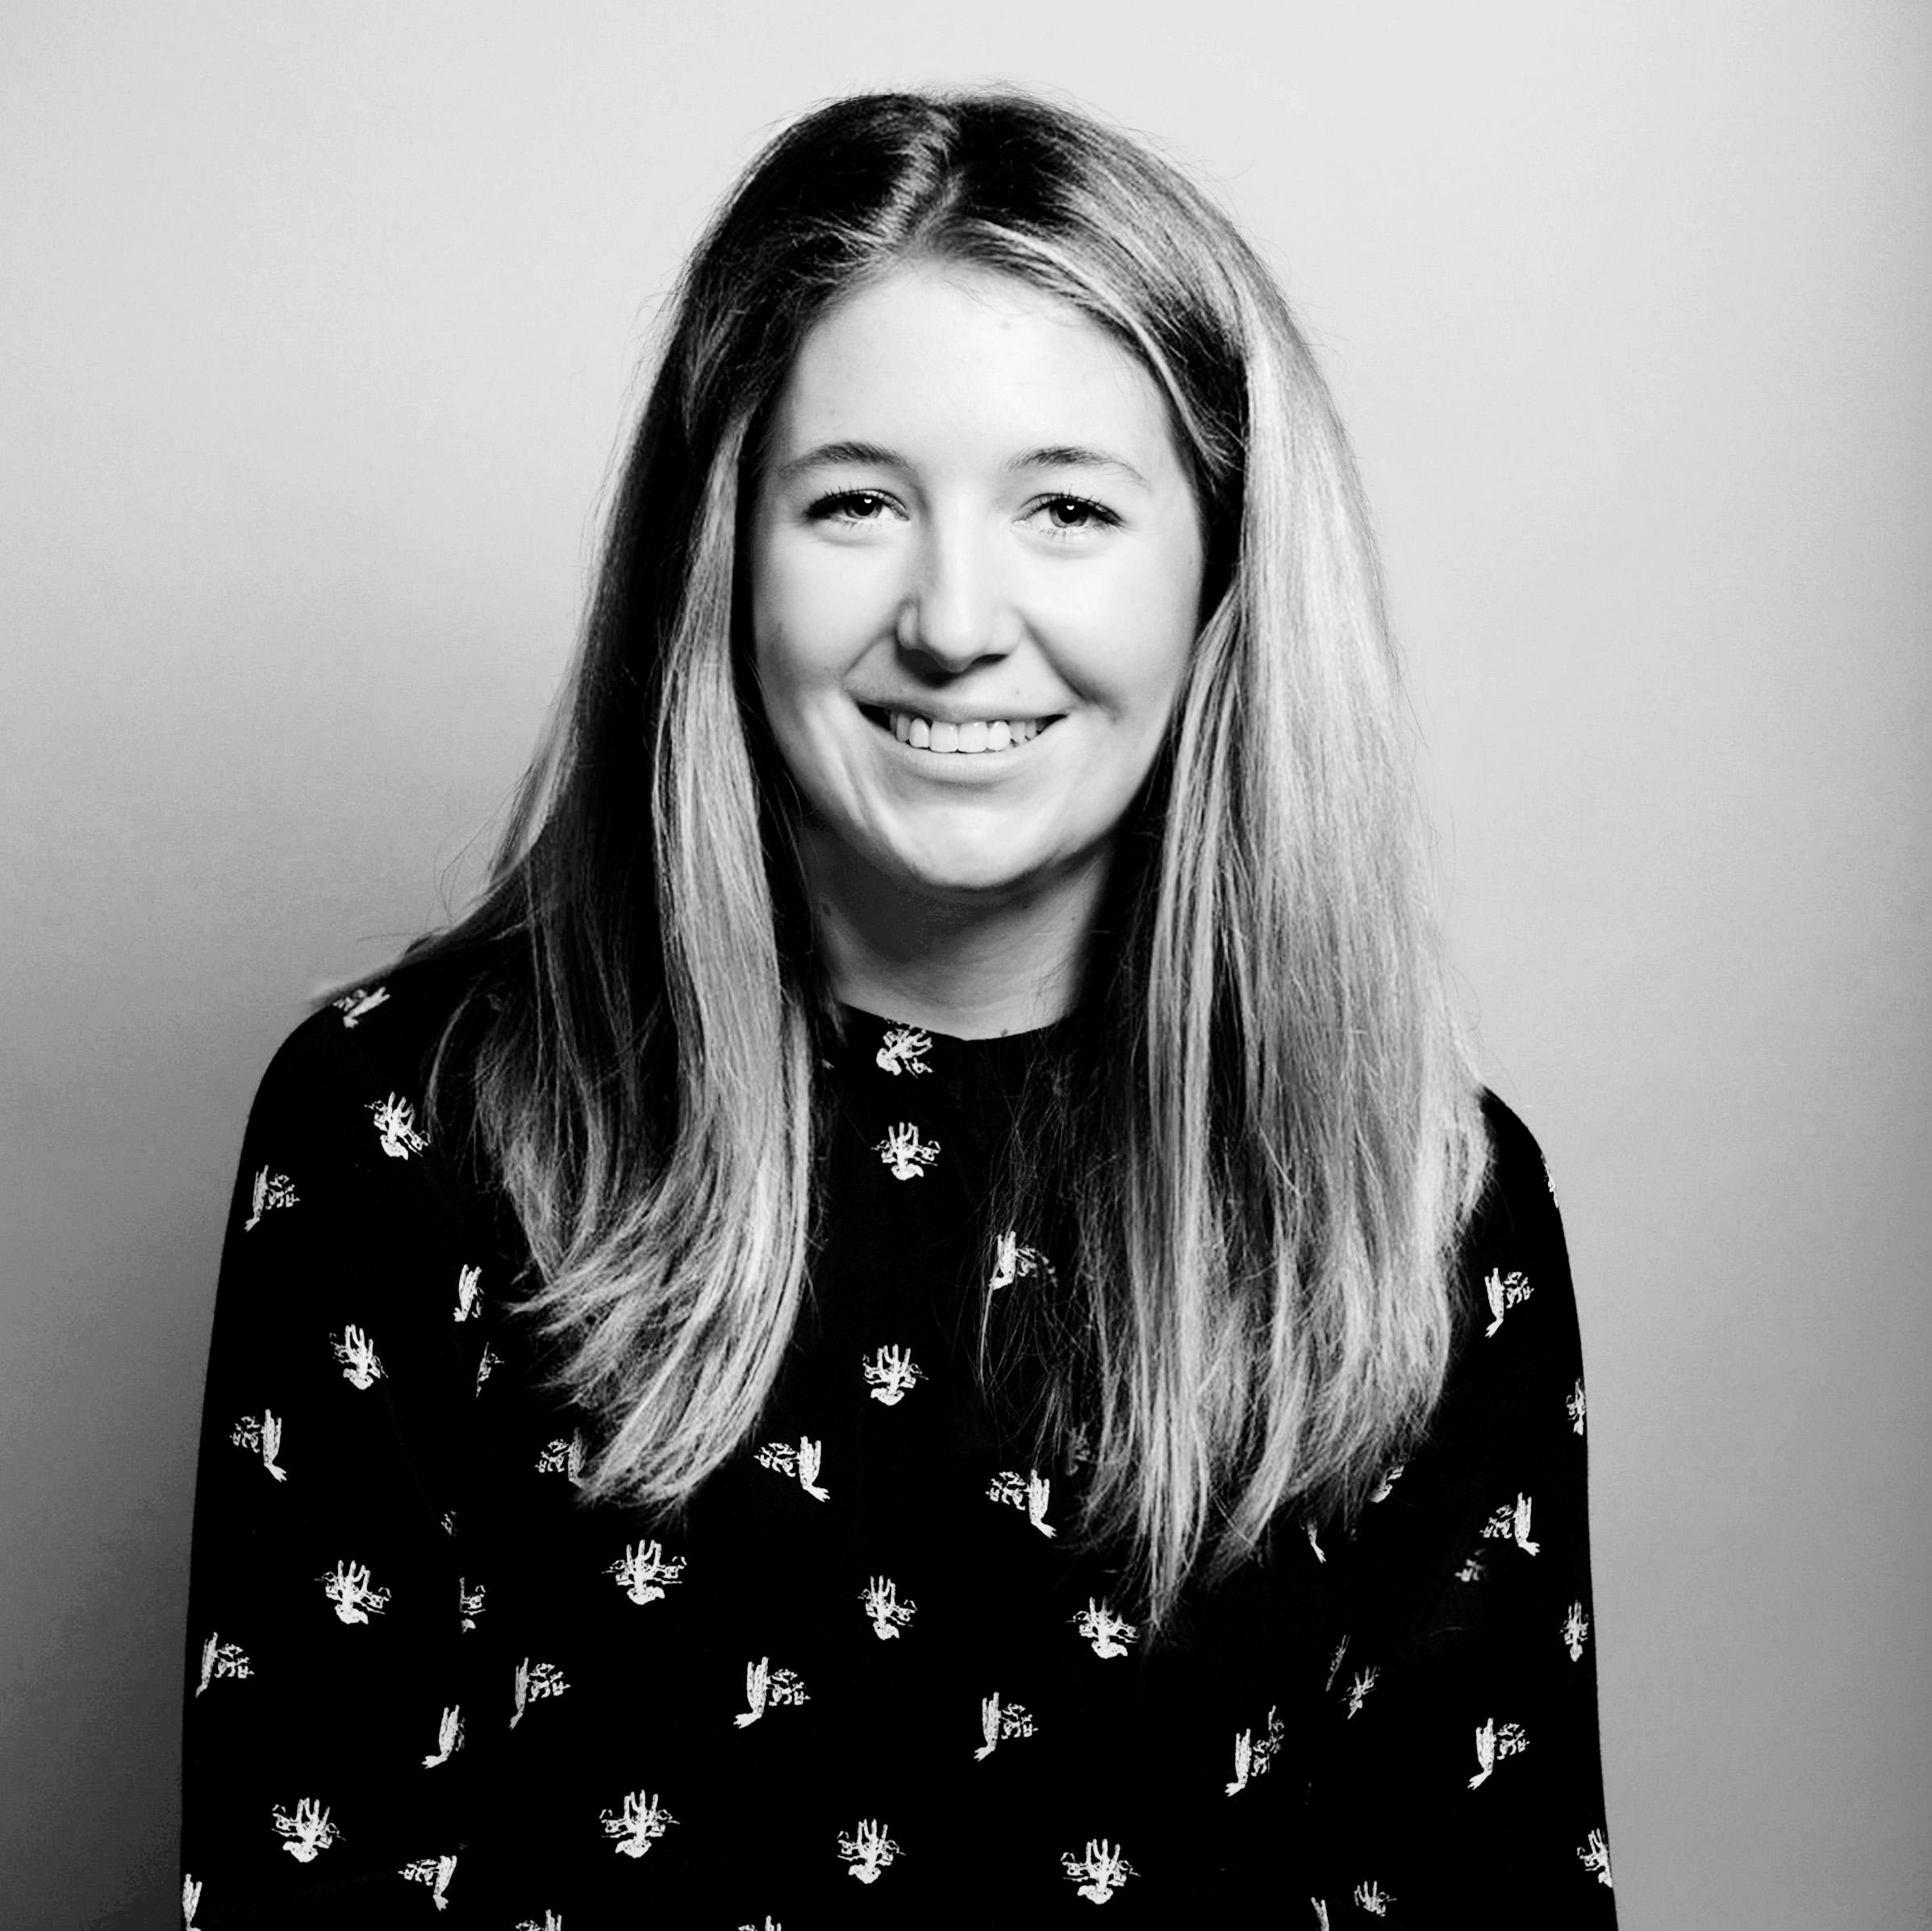 Emily Ditton - Head of Design